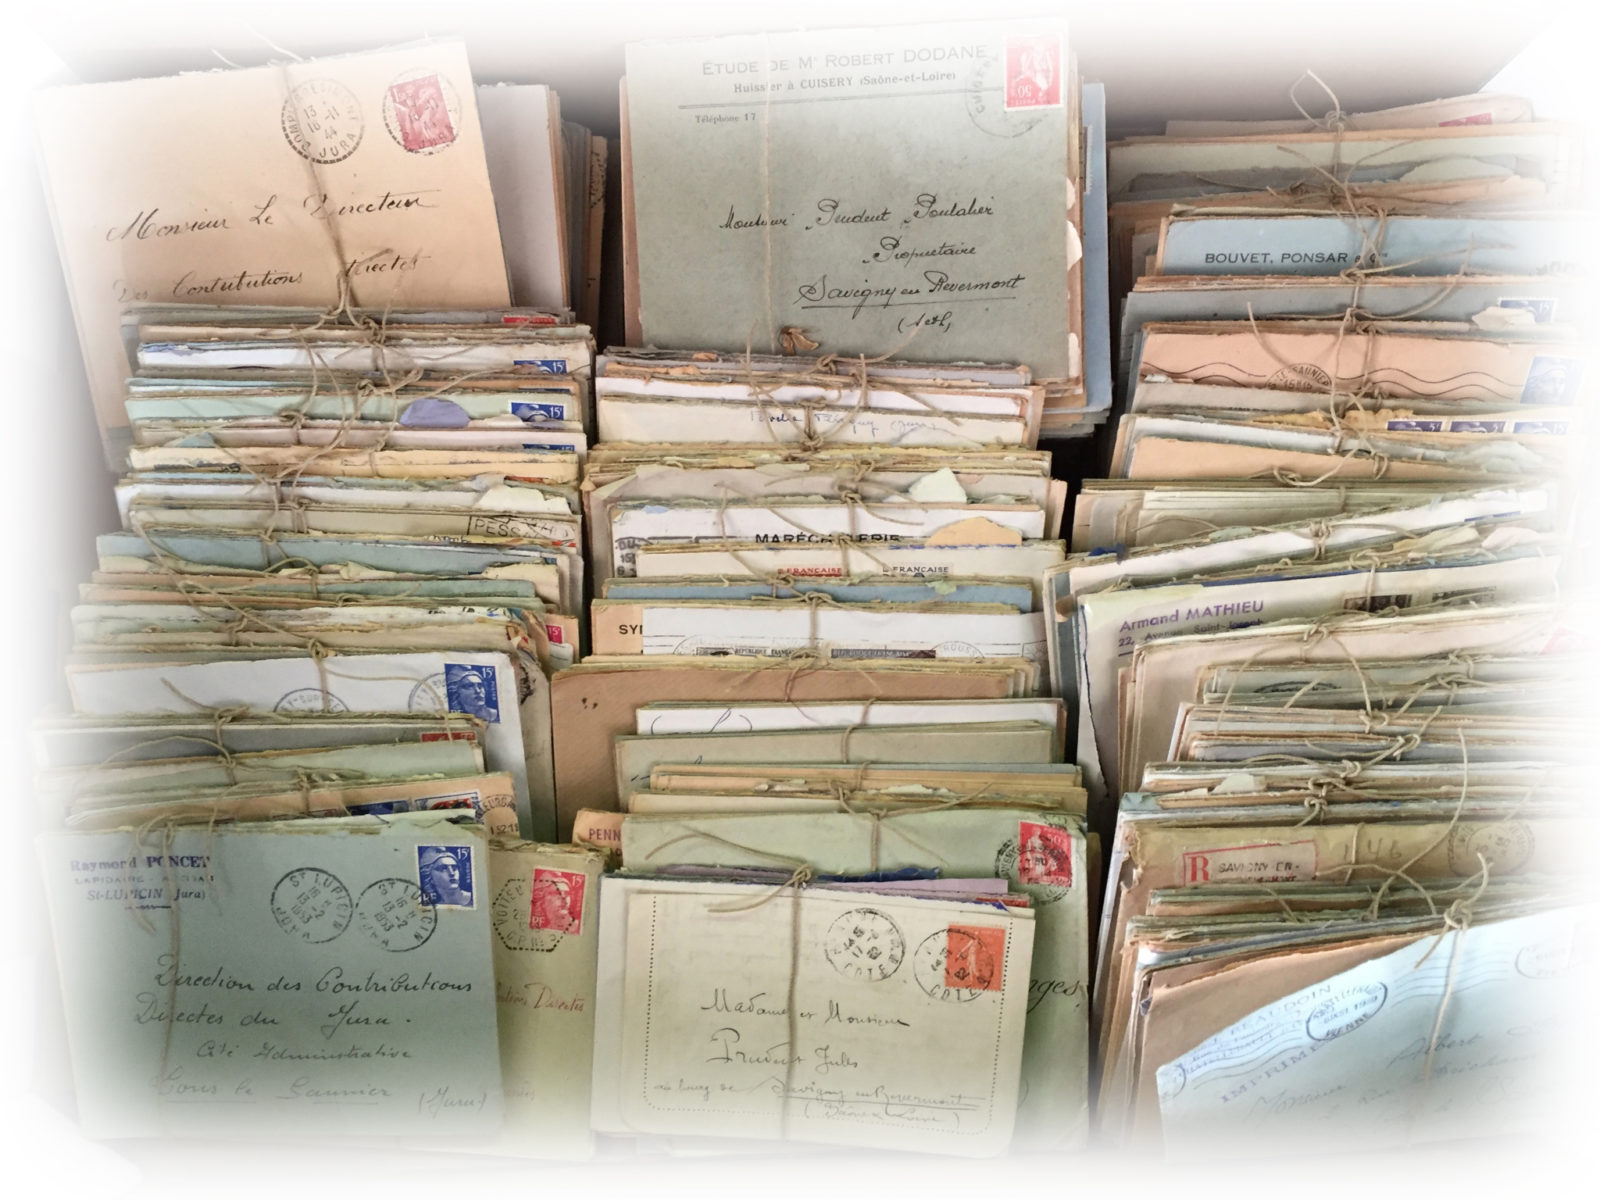 Scribo - Scrittura Bolognese - newsletter